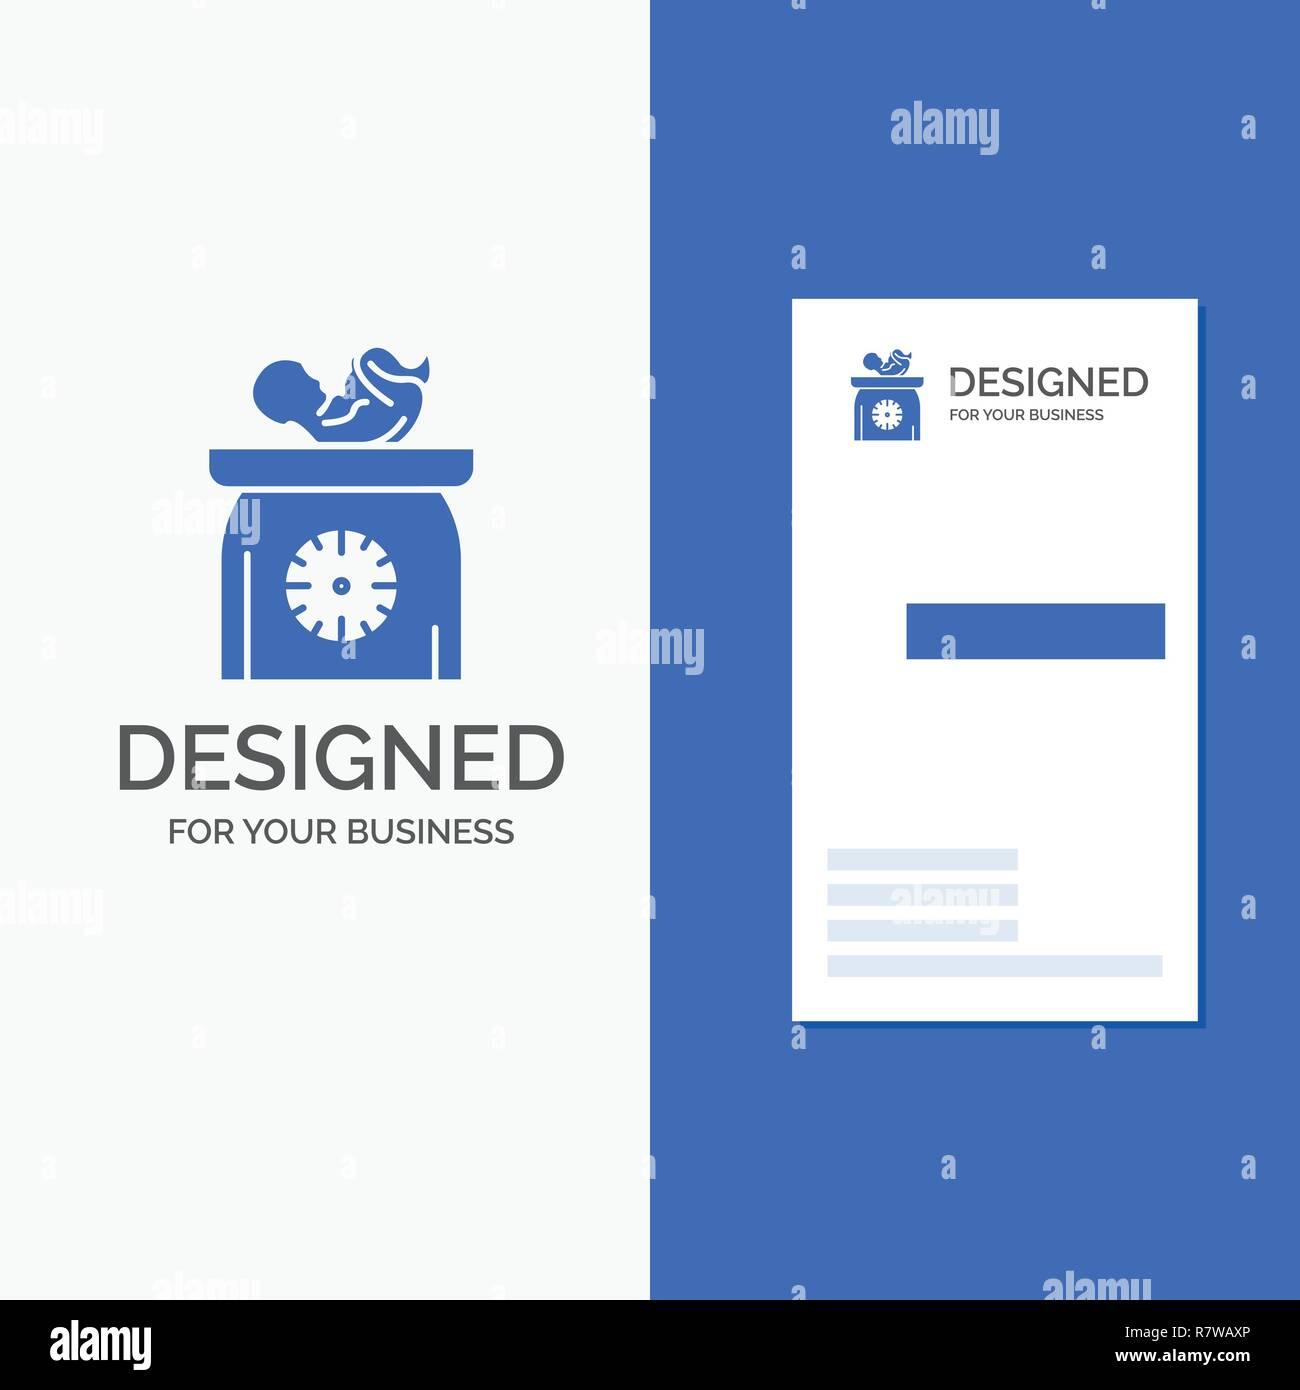 Logo Dentreprise Pour Le Poids Bebe Nouveau Ne Balances Gamin Bleu Vertical Affaires Modele De Carte Visite